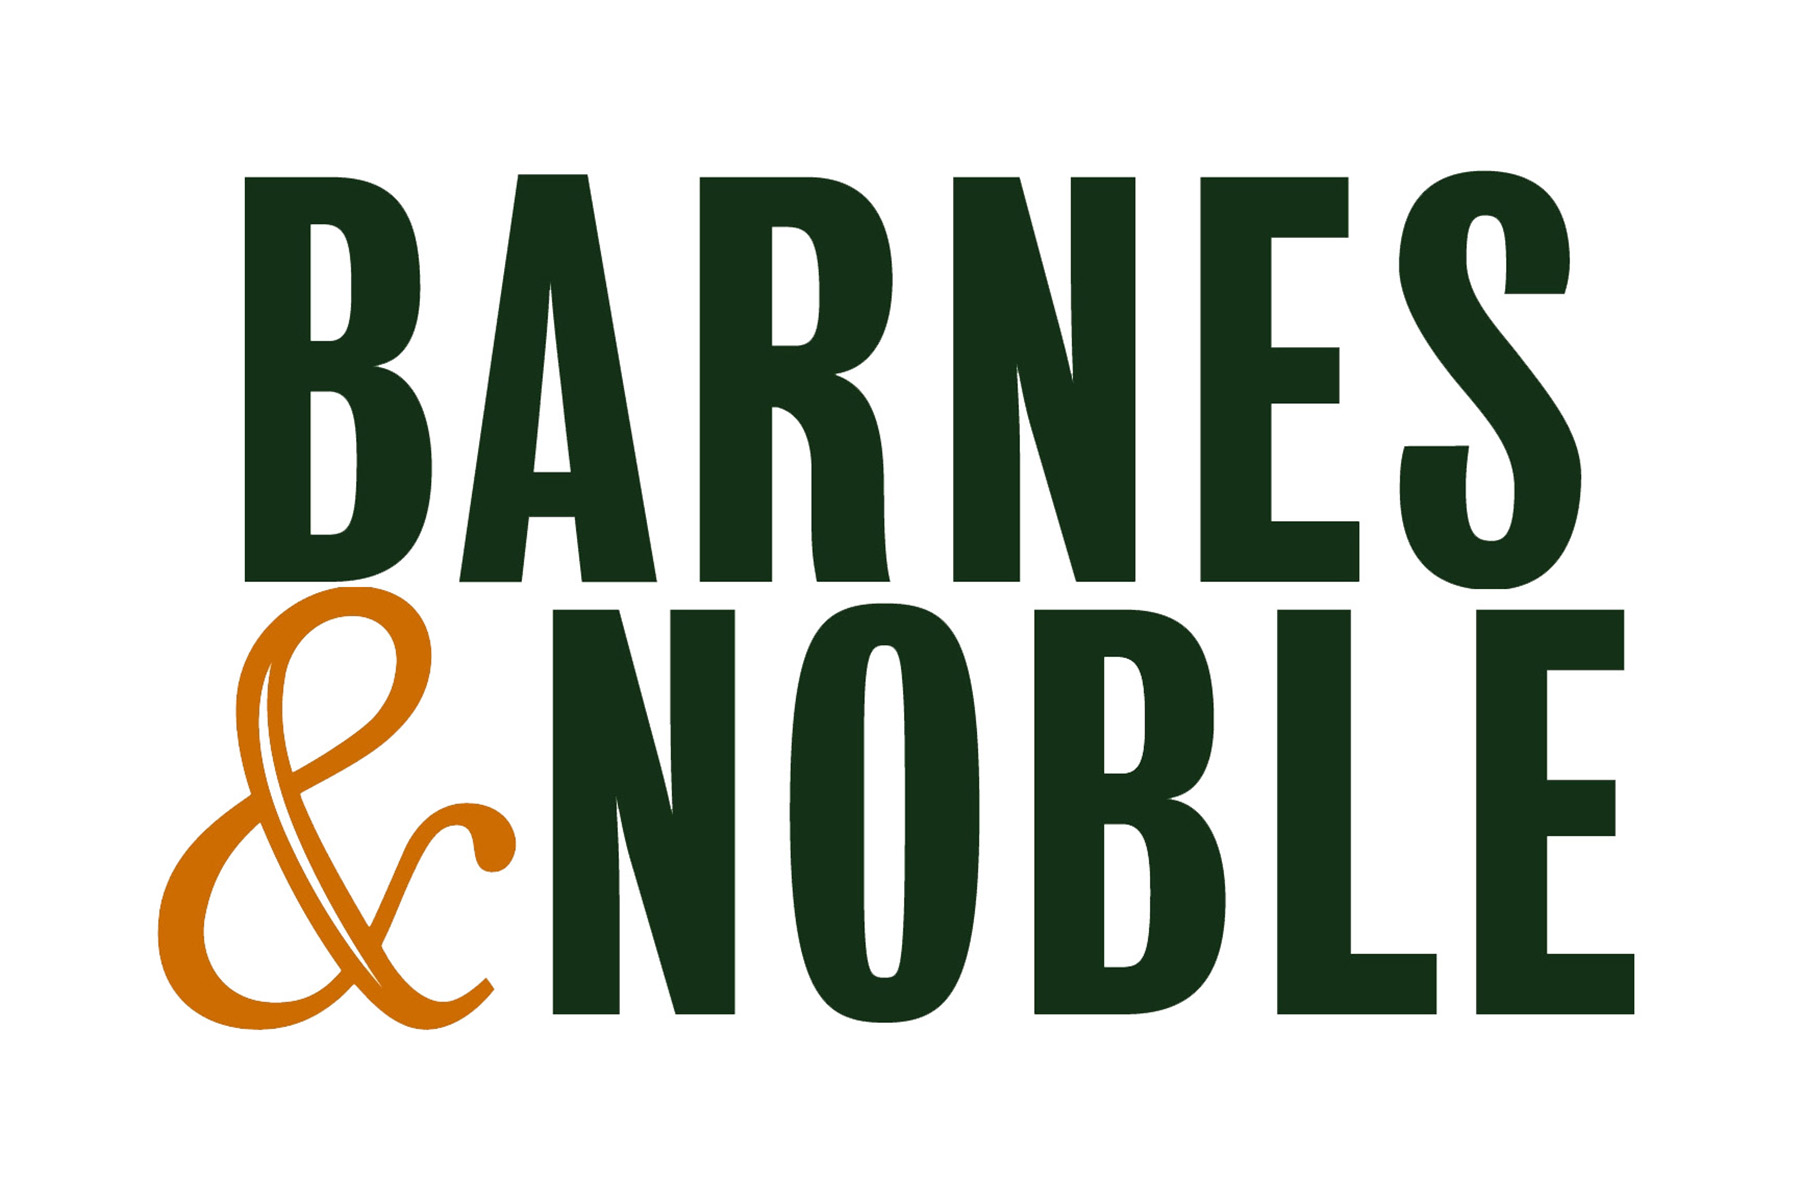 Barnes & Noble(3060 Mockingbird Ln)